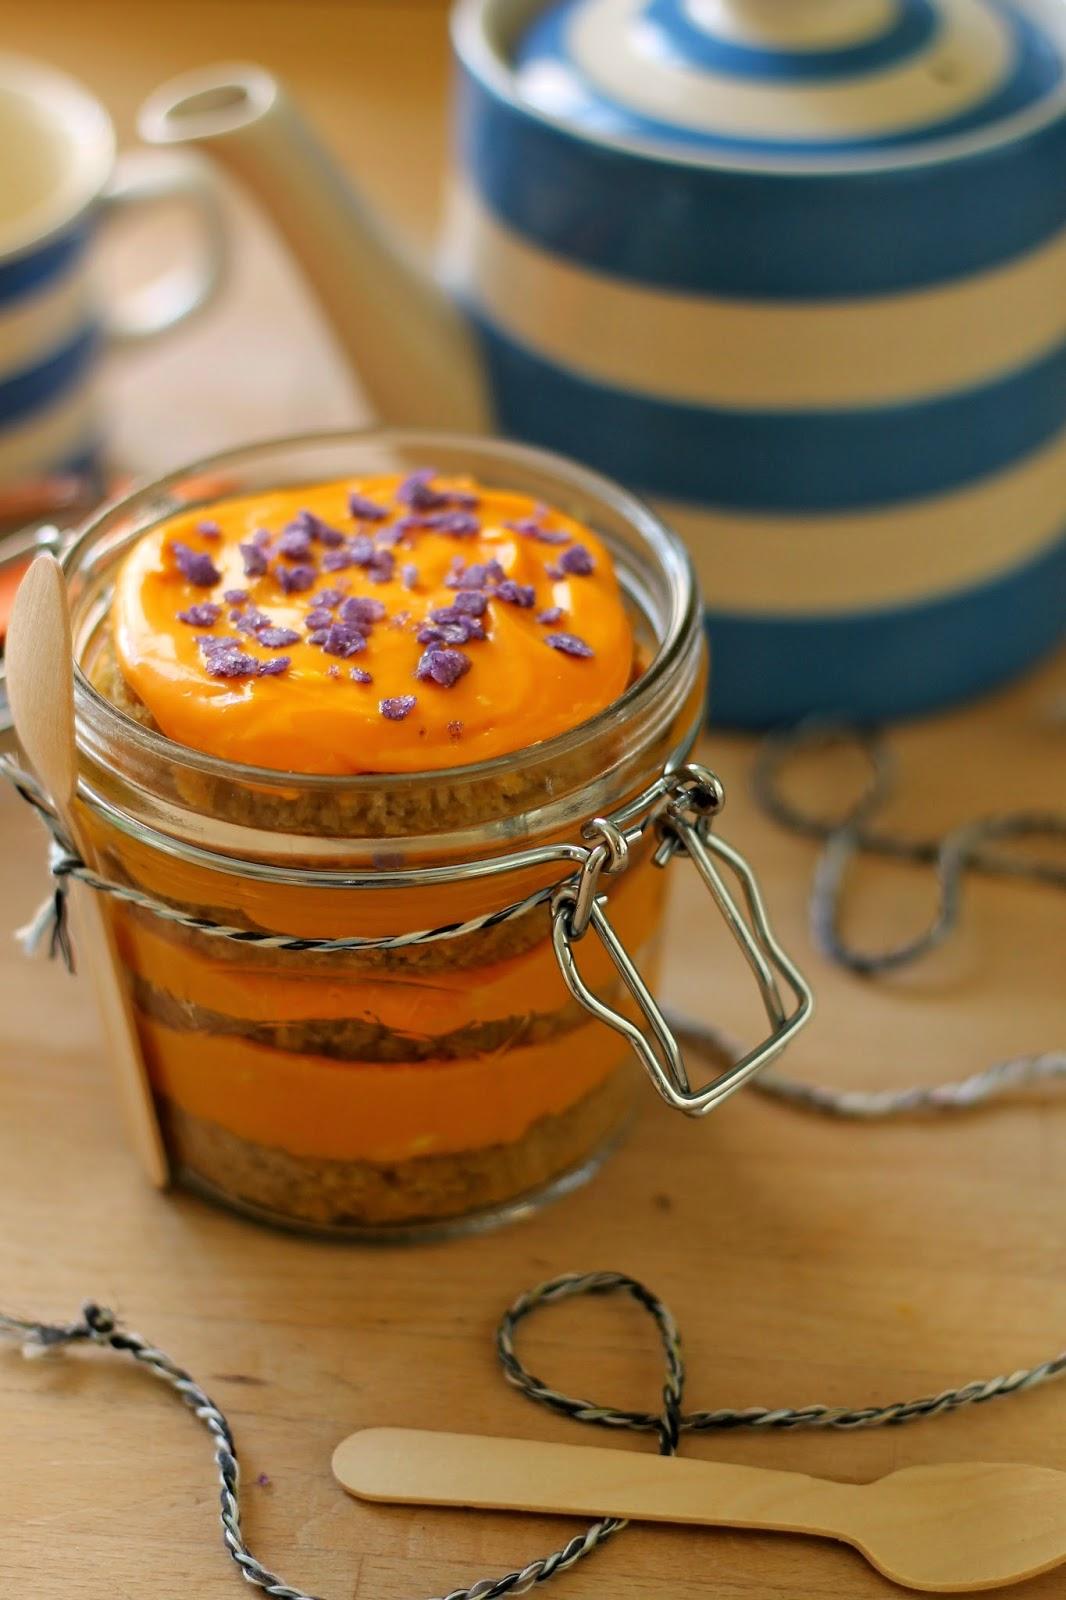 The Crafty Larder: Spiced Pumpkin Cake In a Jar